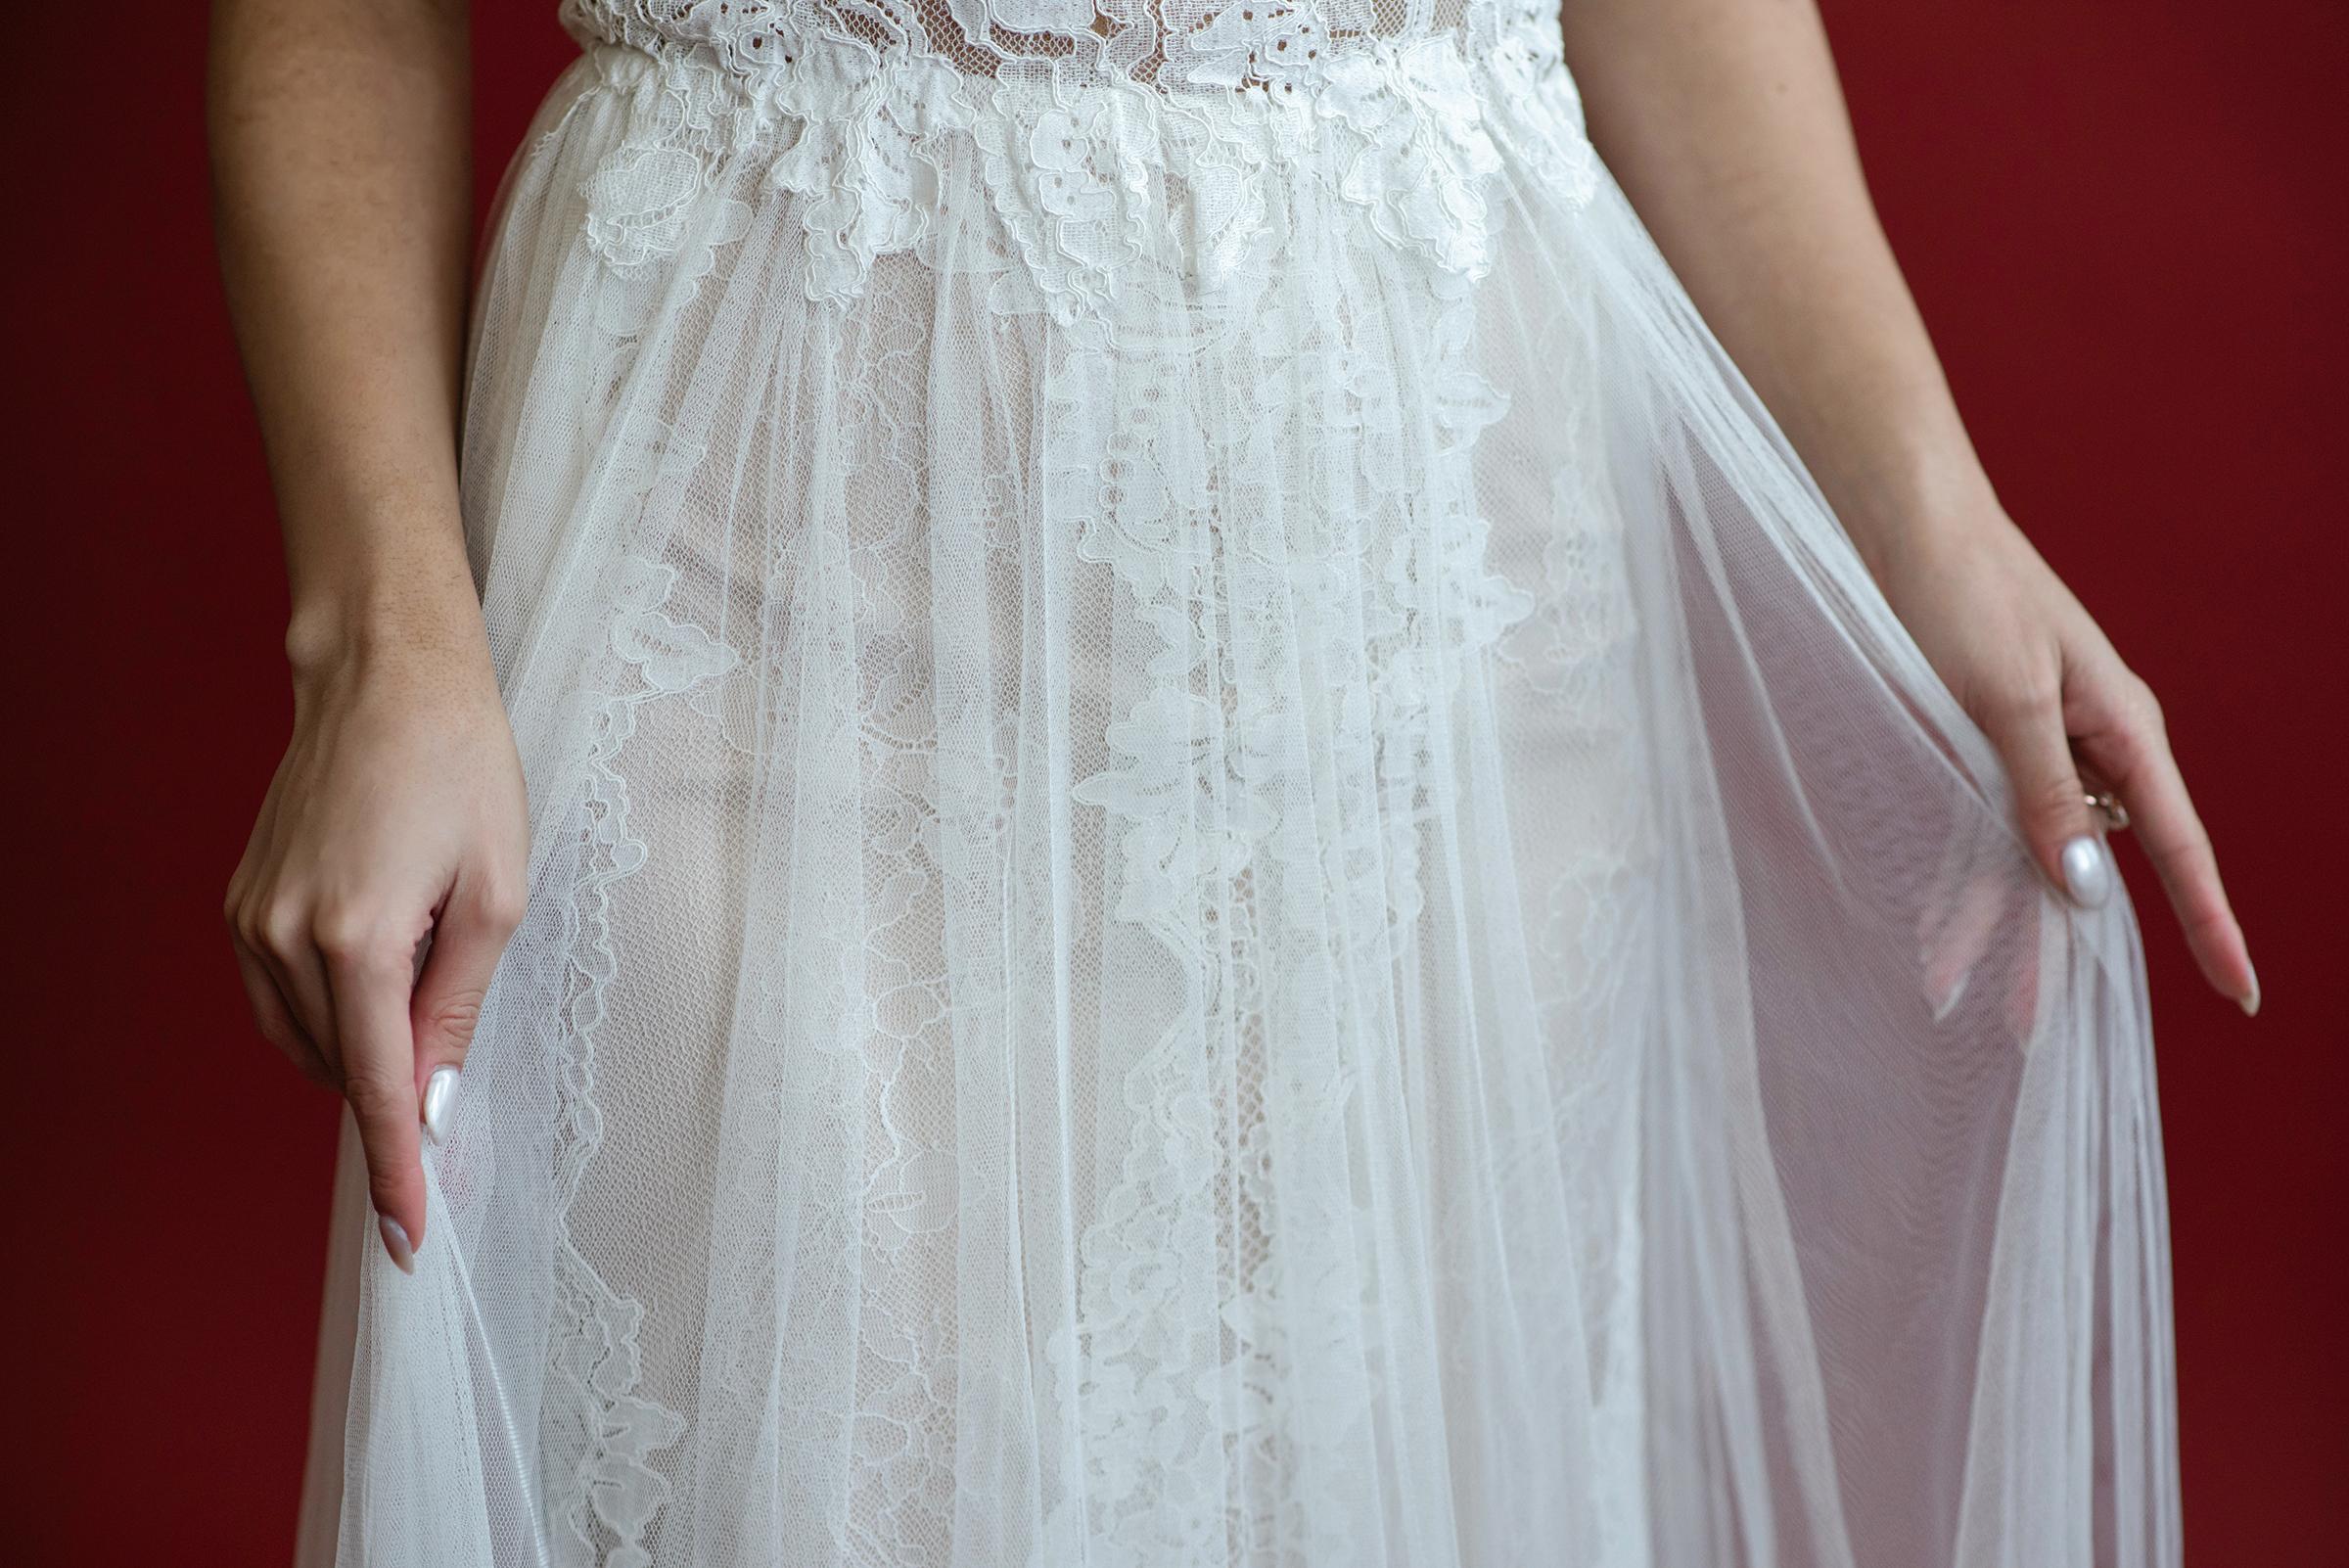 Stephanie-First Dress Details-1.jpg